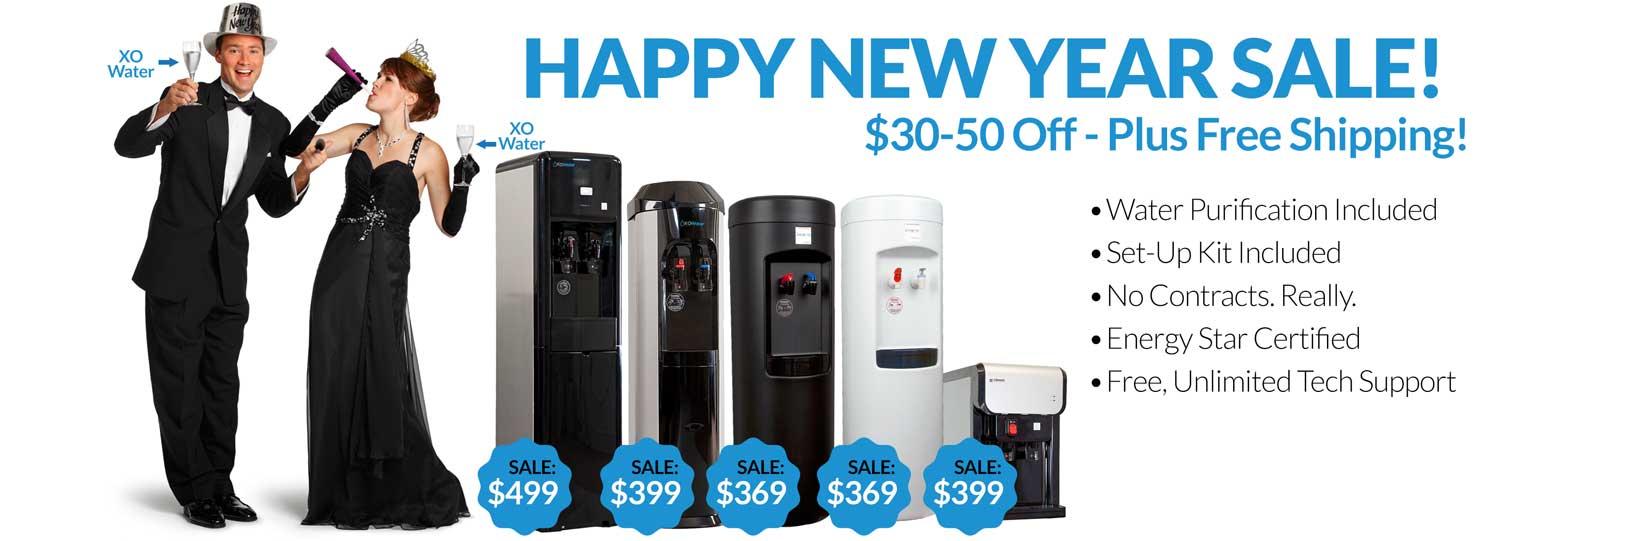 XO bottleless water cooler lineup - New Years sale